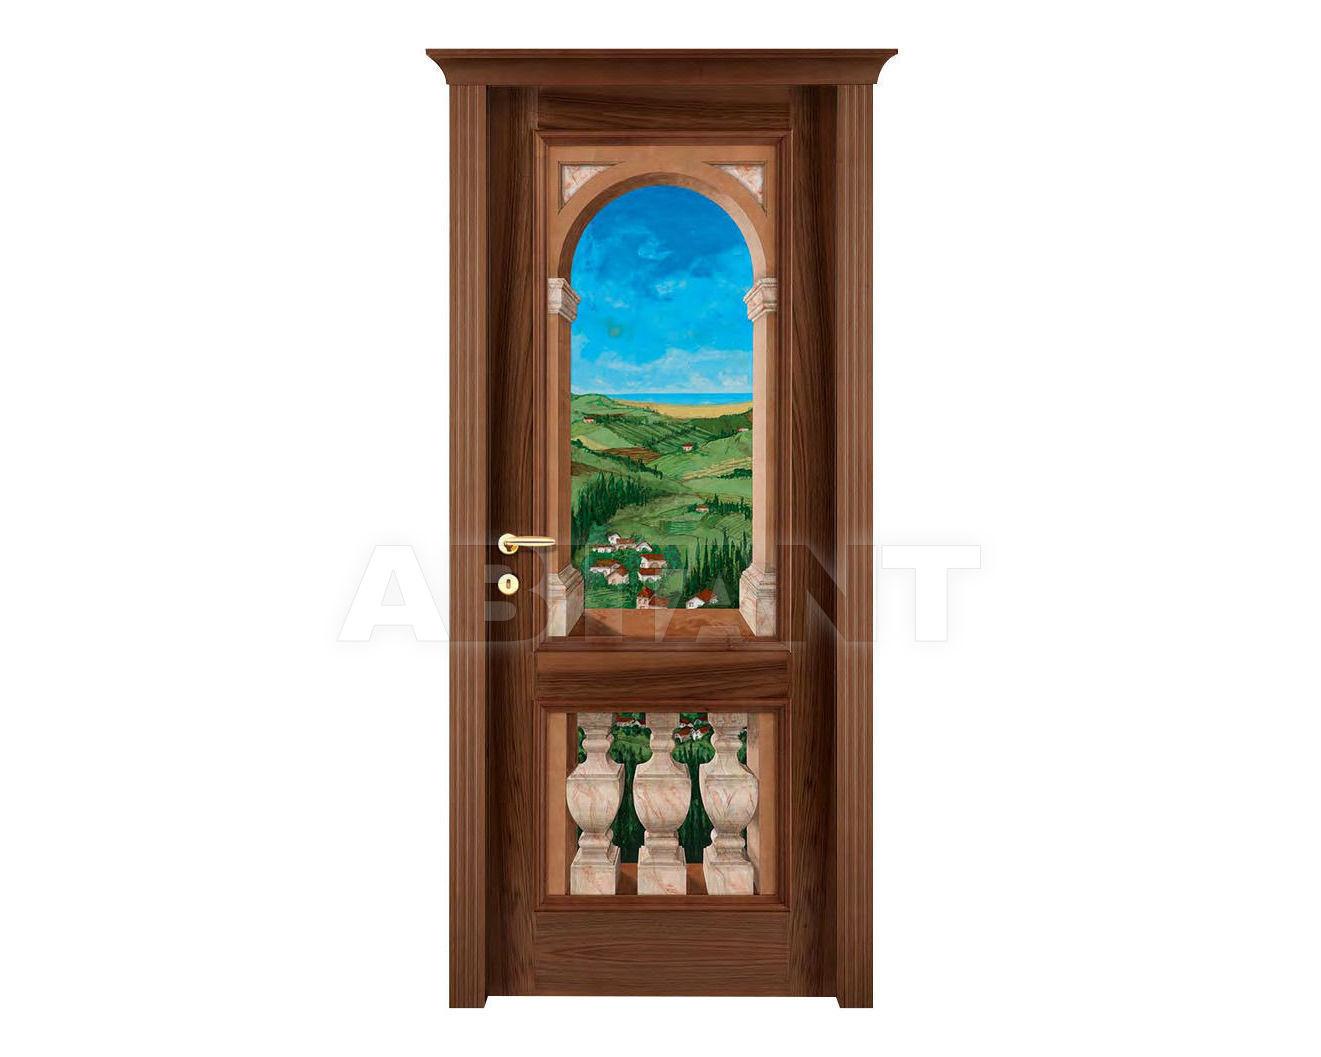 Купить Дверь деревянная Fioravazzi Classiche PATRIZIA 27 TROMPE L'OEIL